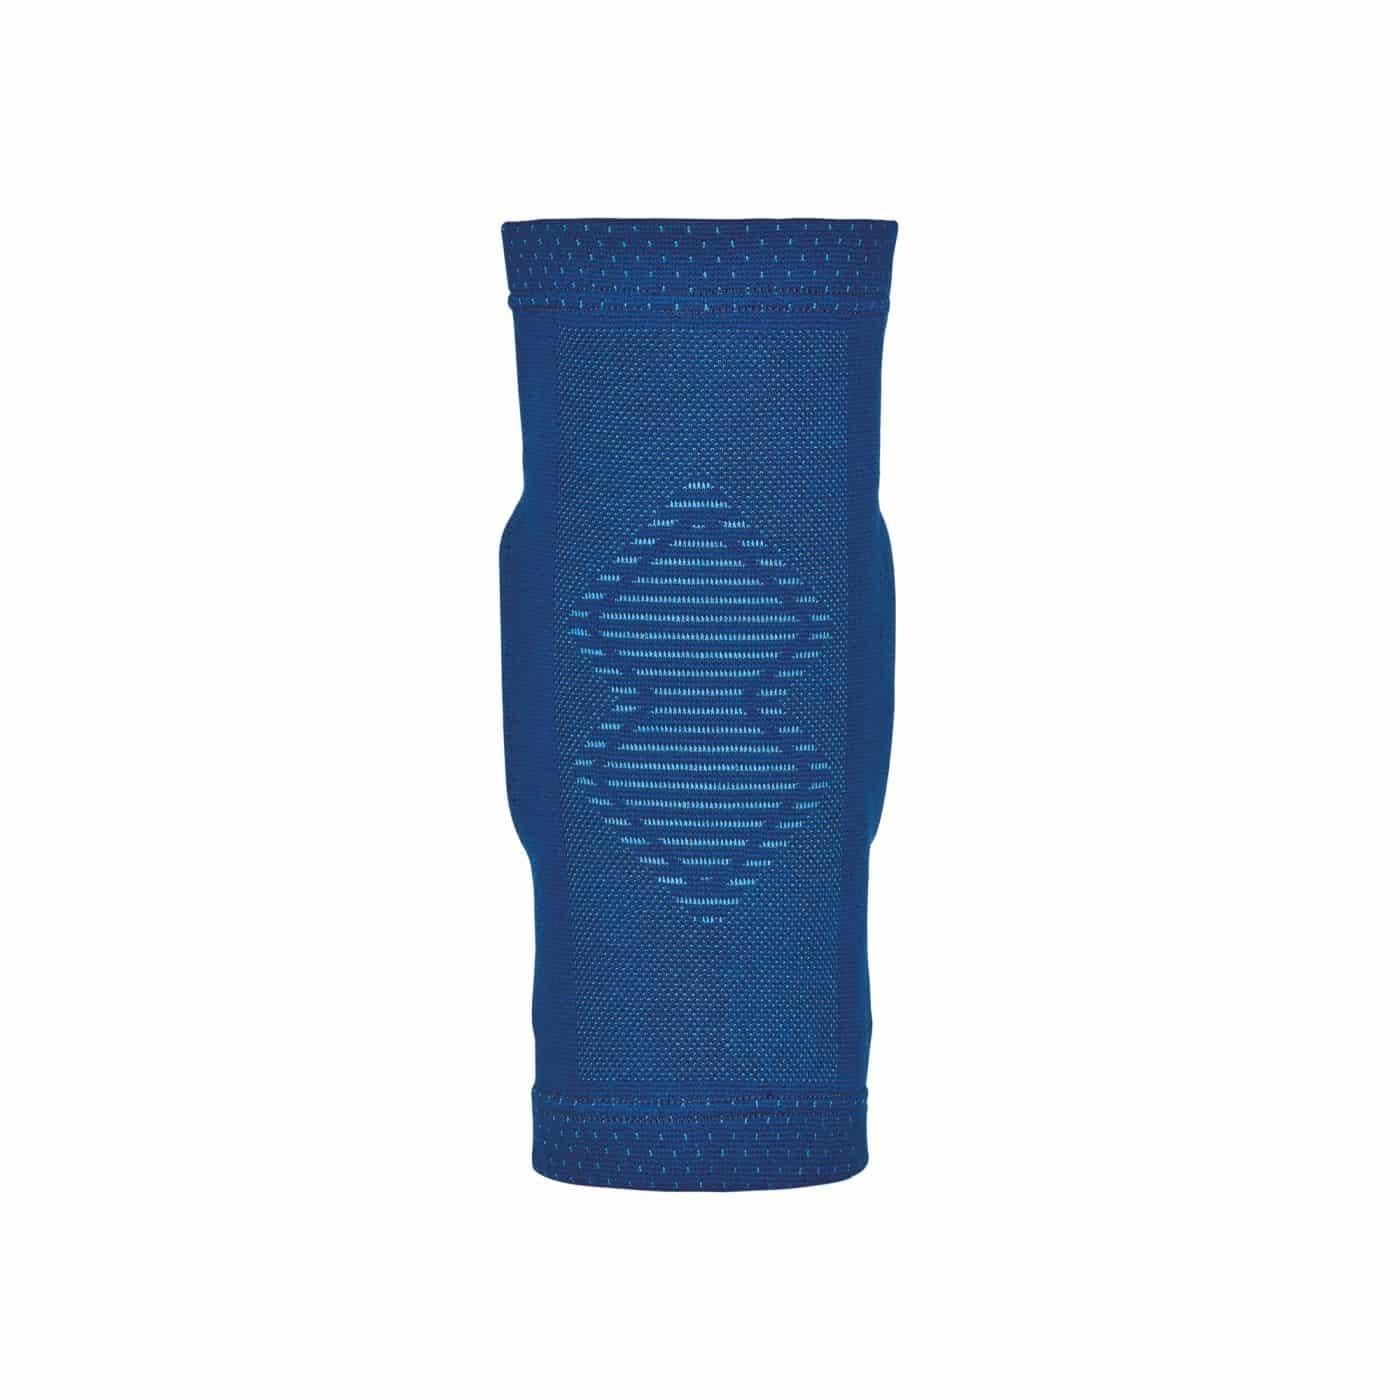 errea-tokyo-evolution-2020-genouillères-volley-knee-pad-volleypack-3